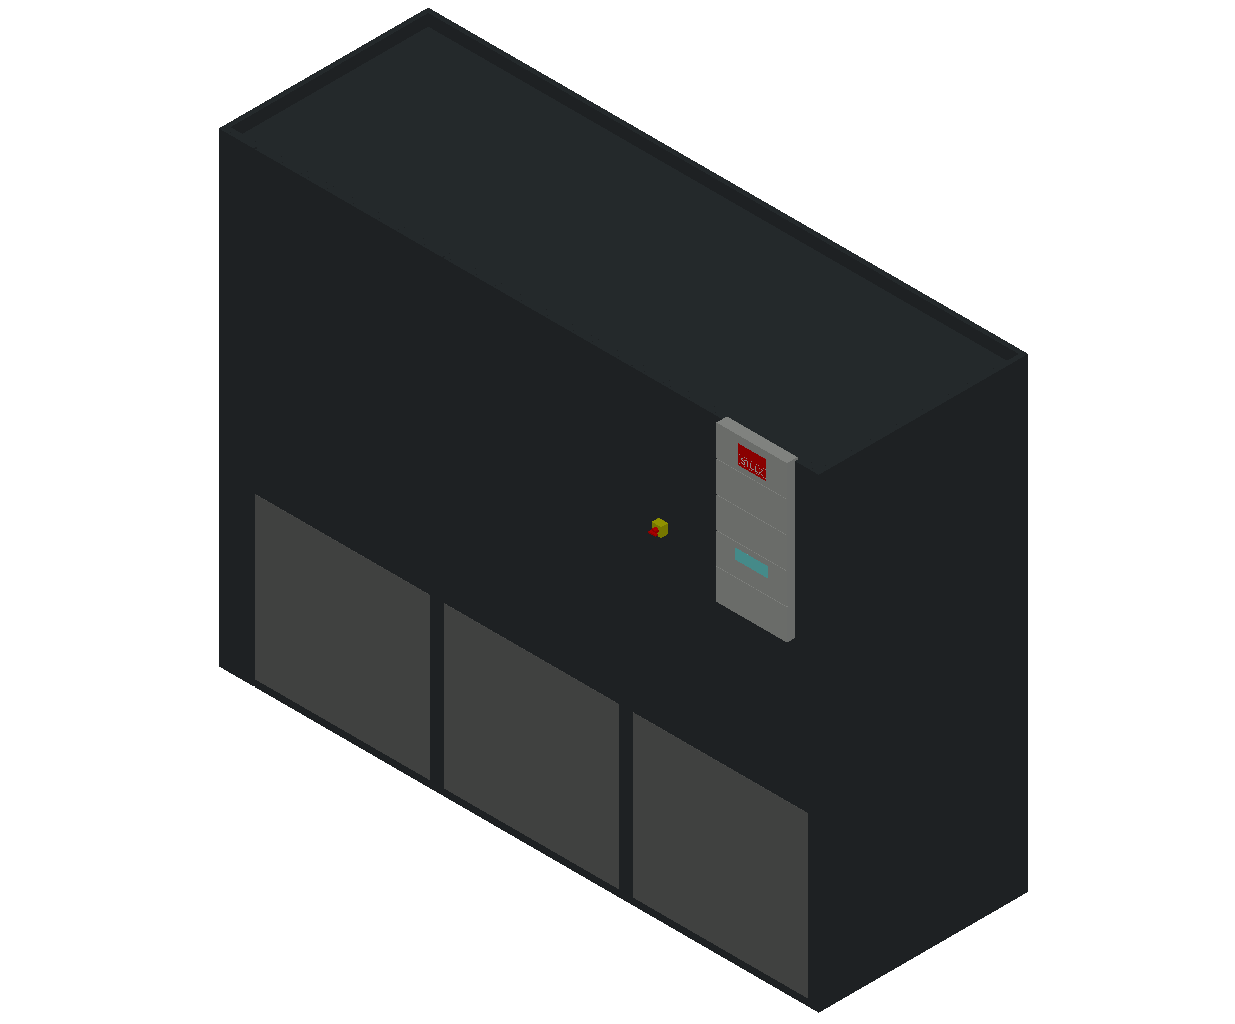 HC_Air Conditioner_Indoor Unit_MEPcontent_STULZ_CyberAir 3PRO_ALU_Dual Circuit GES_ALU_882_GES_INT-EN.dwg